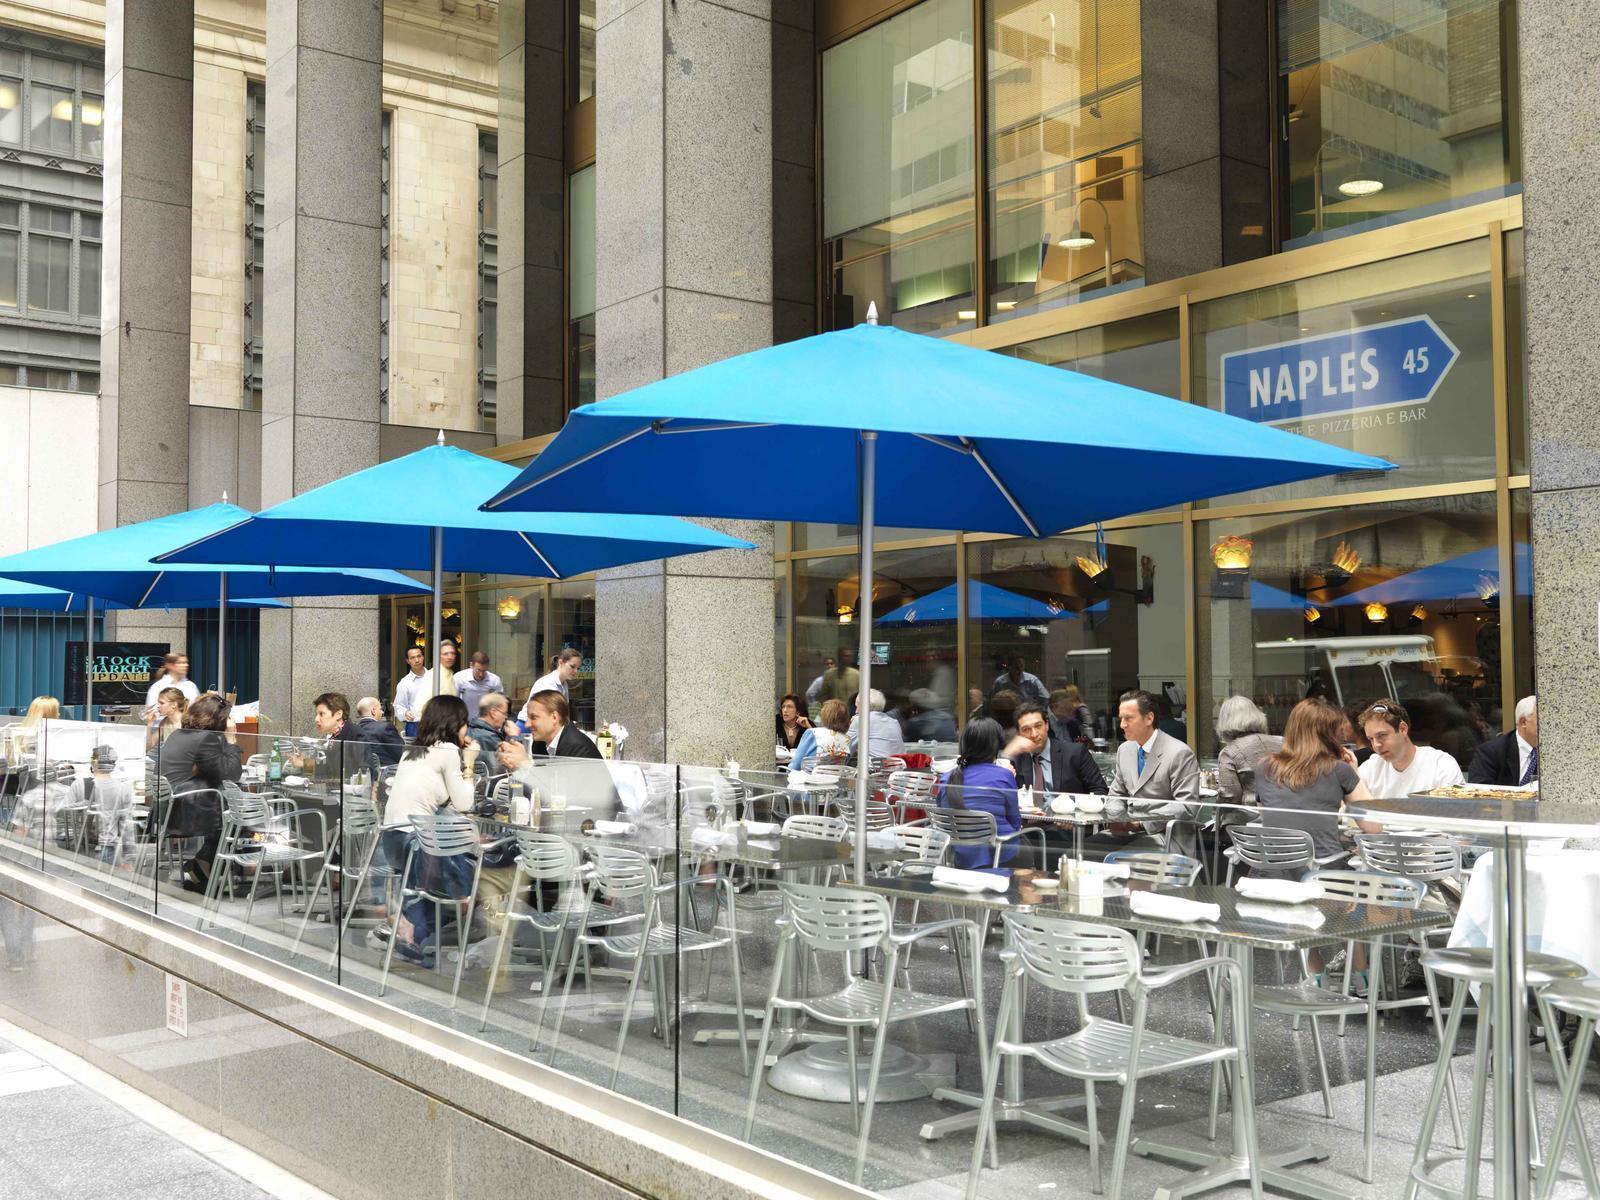 Italian Restaurants In Nyc: Naples 45 Ristorante E Pizzeria NYC